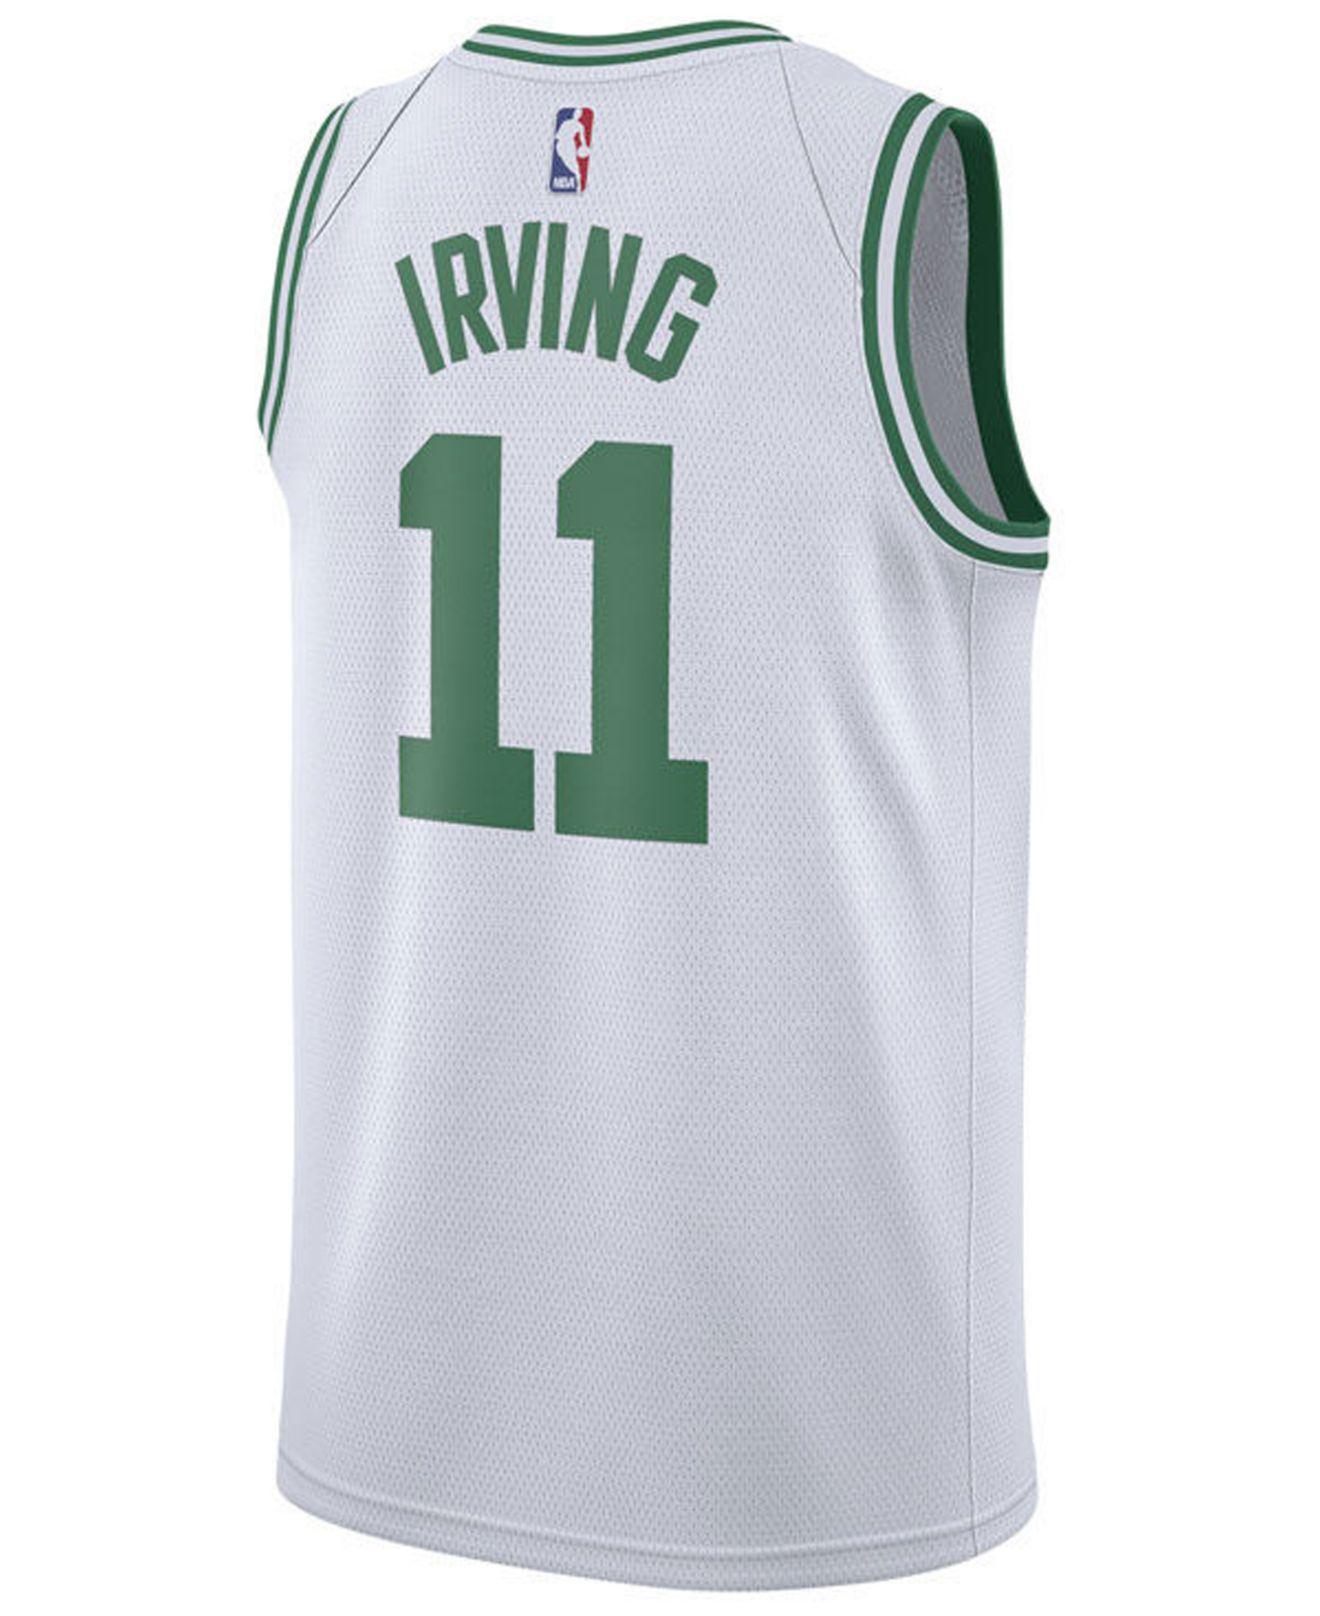 c2cc7e235 Nike. Men s White Kyrie Irving Association Edition Swingman (boston Celtics)  Nba Connected Jersey